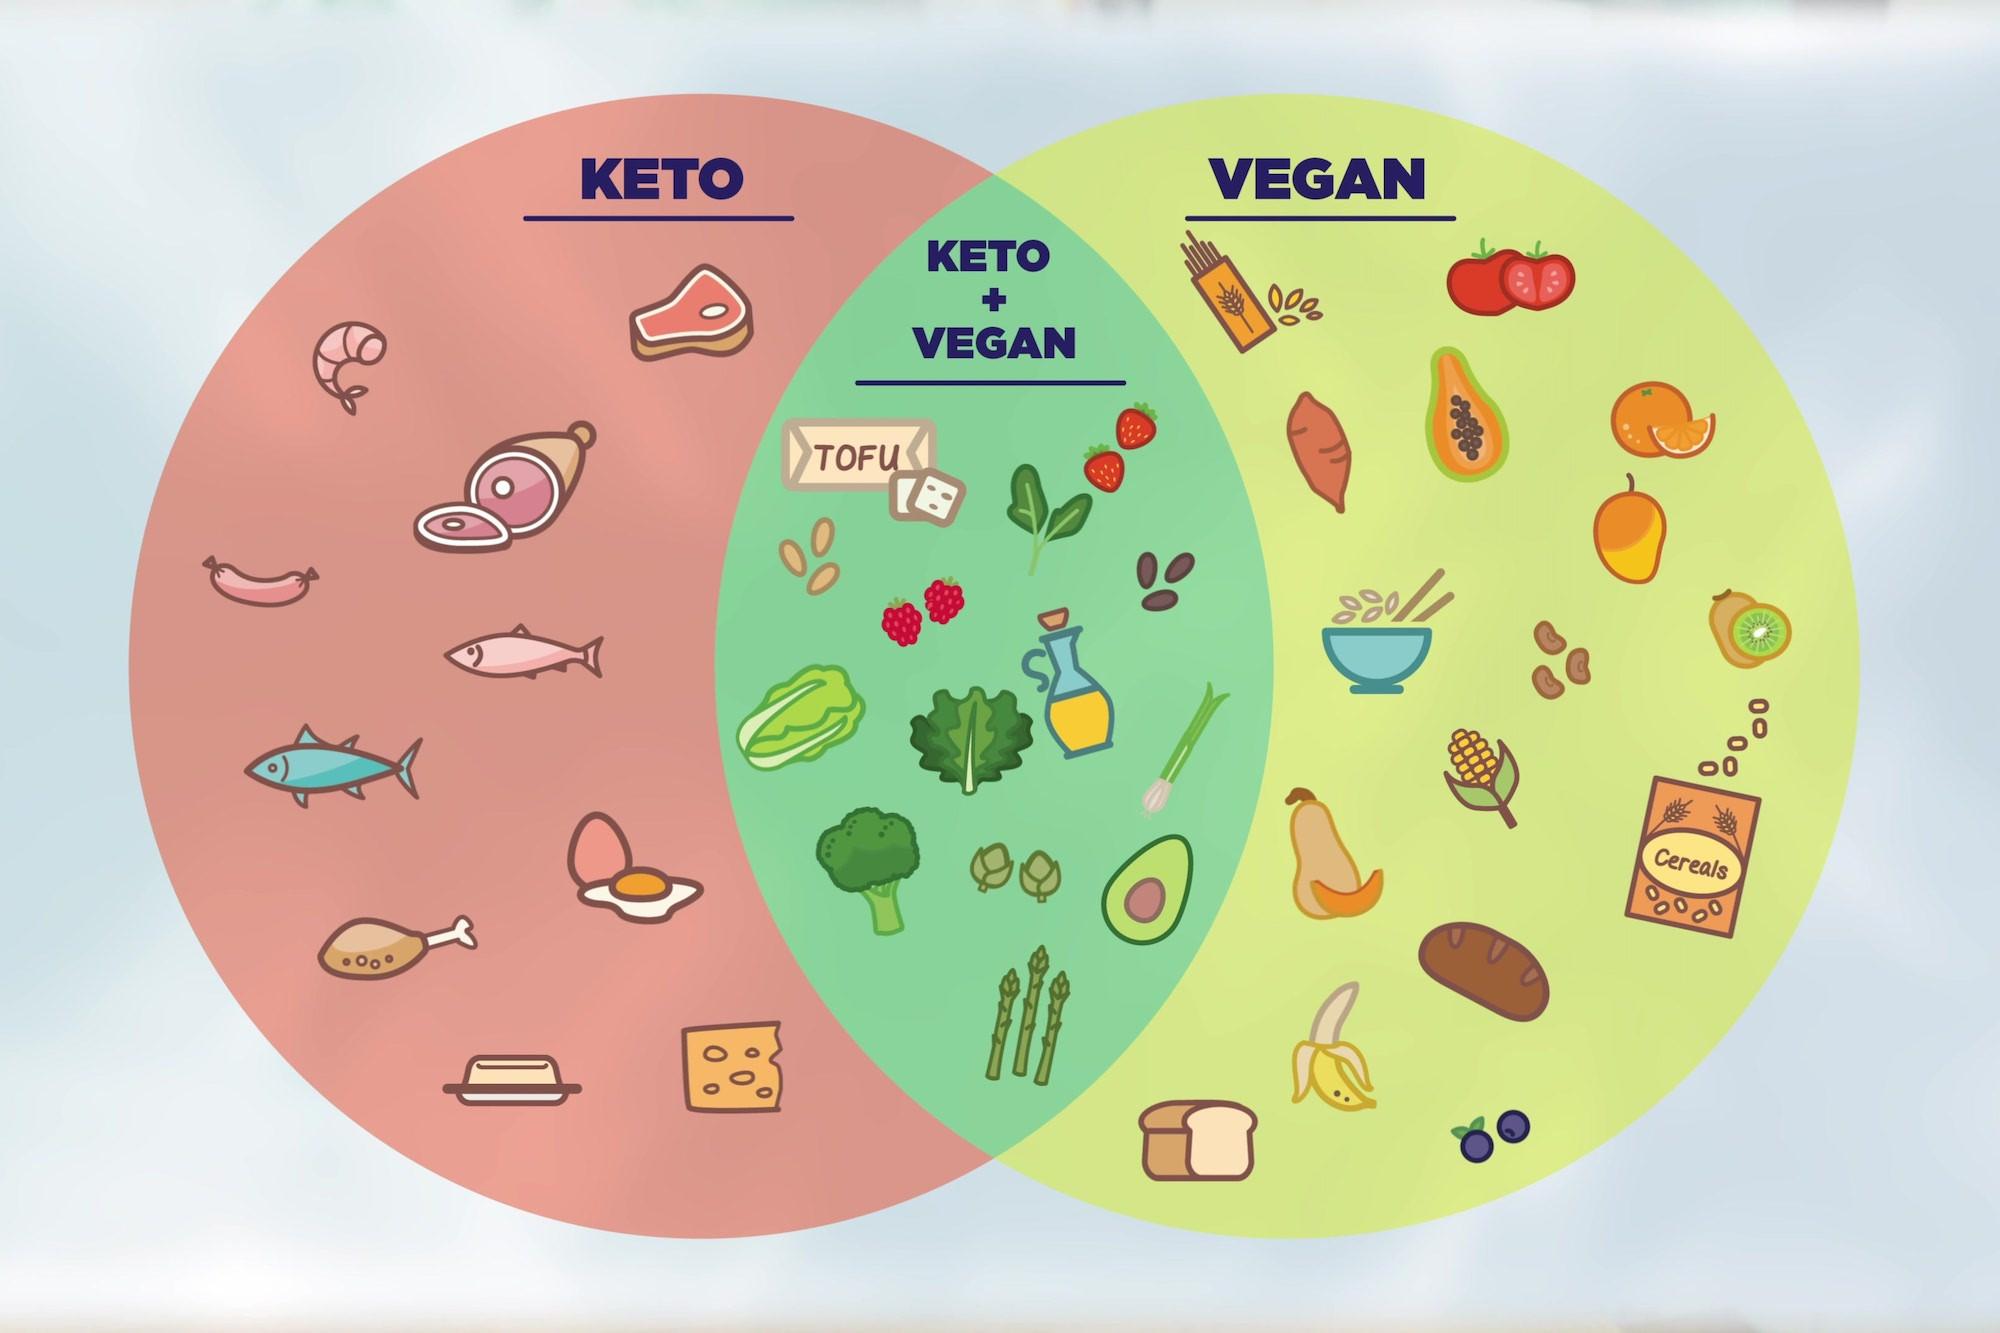 Keto Vegan Diet Plan  Keto vs Vegan Foods